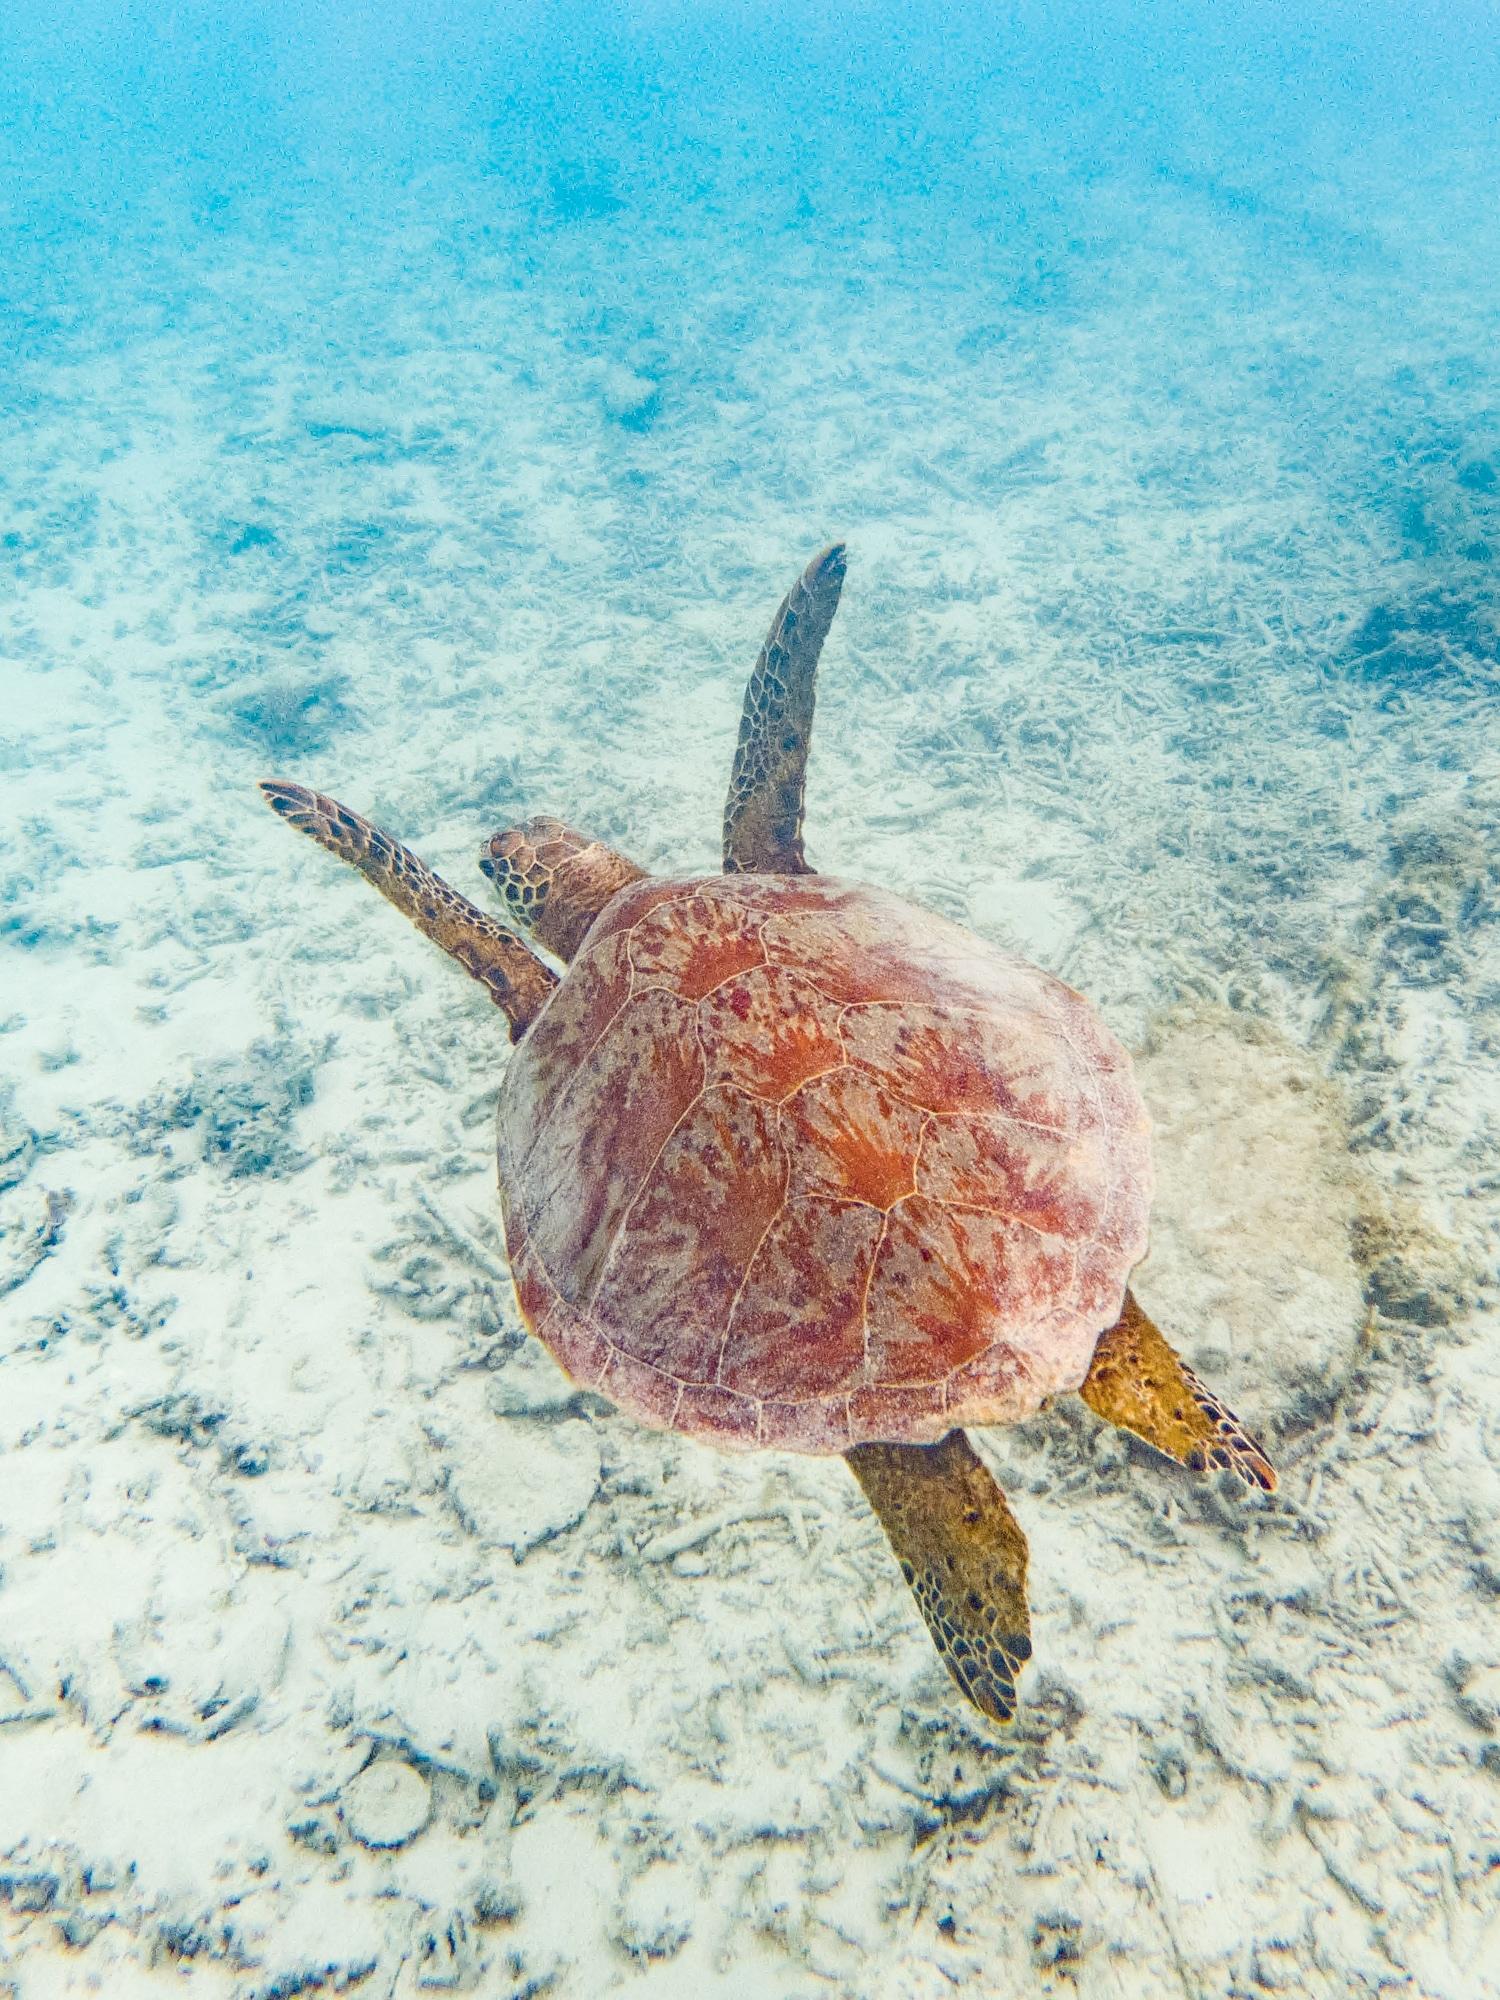 Okinawa snorkeling tortues